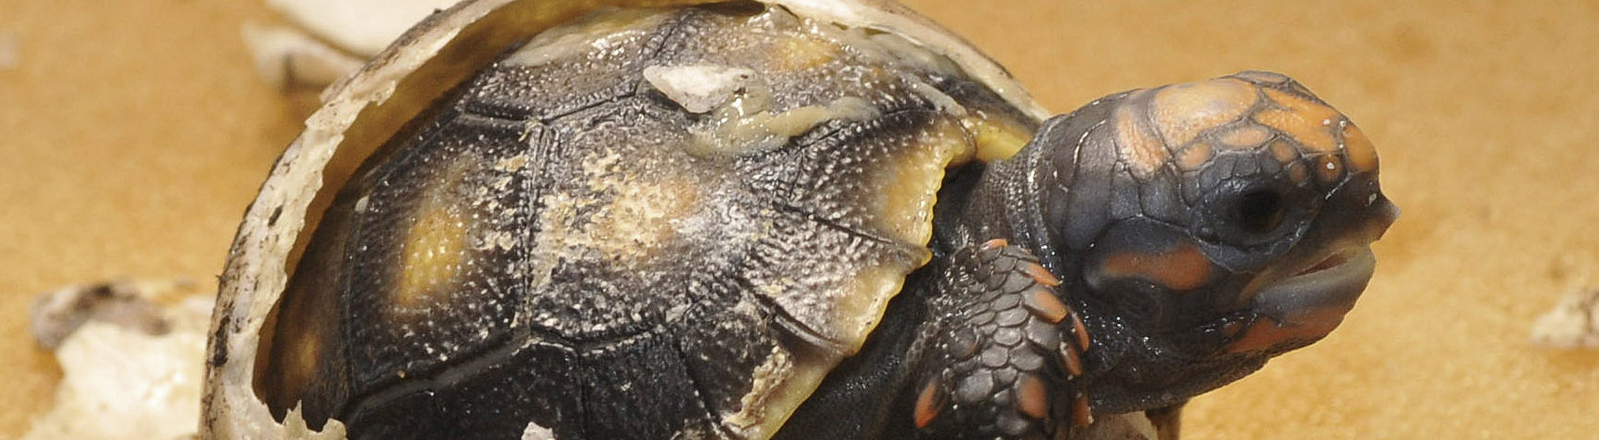 Rotfuß-Schildkröte schlüpft aus dem Ei